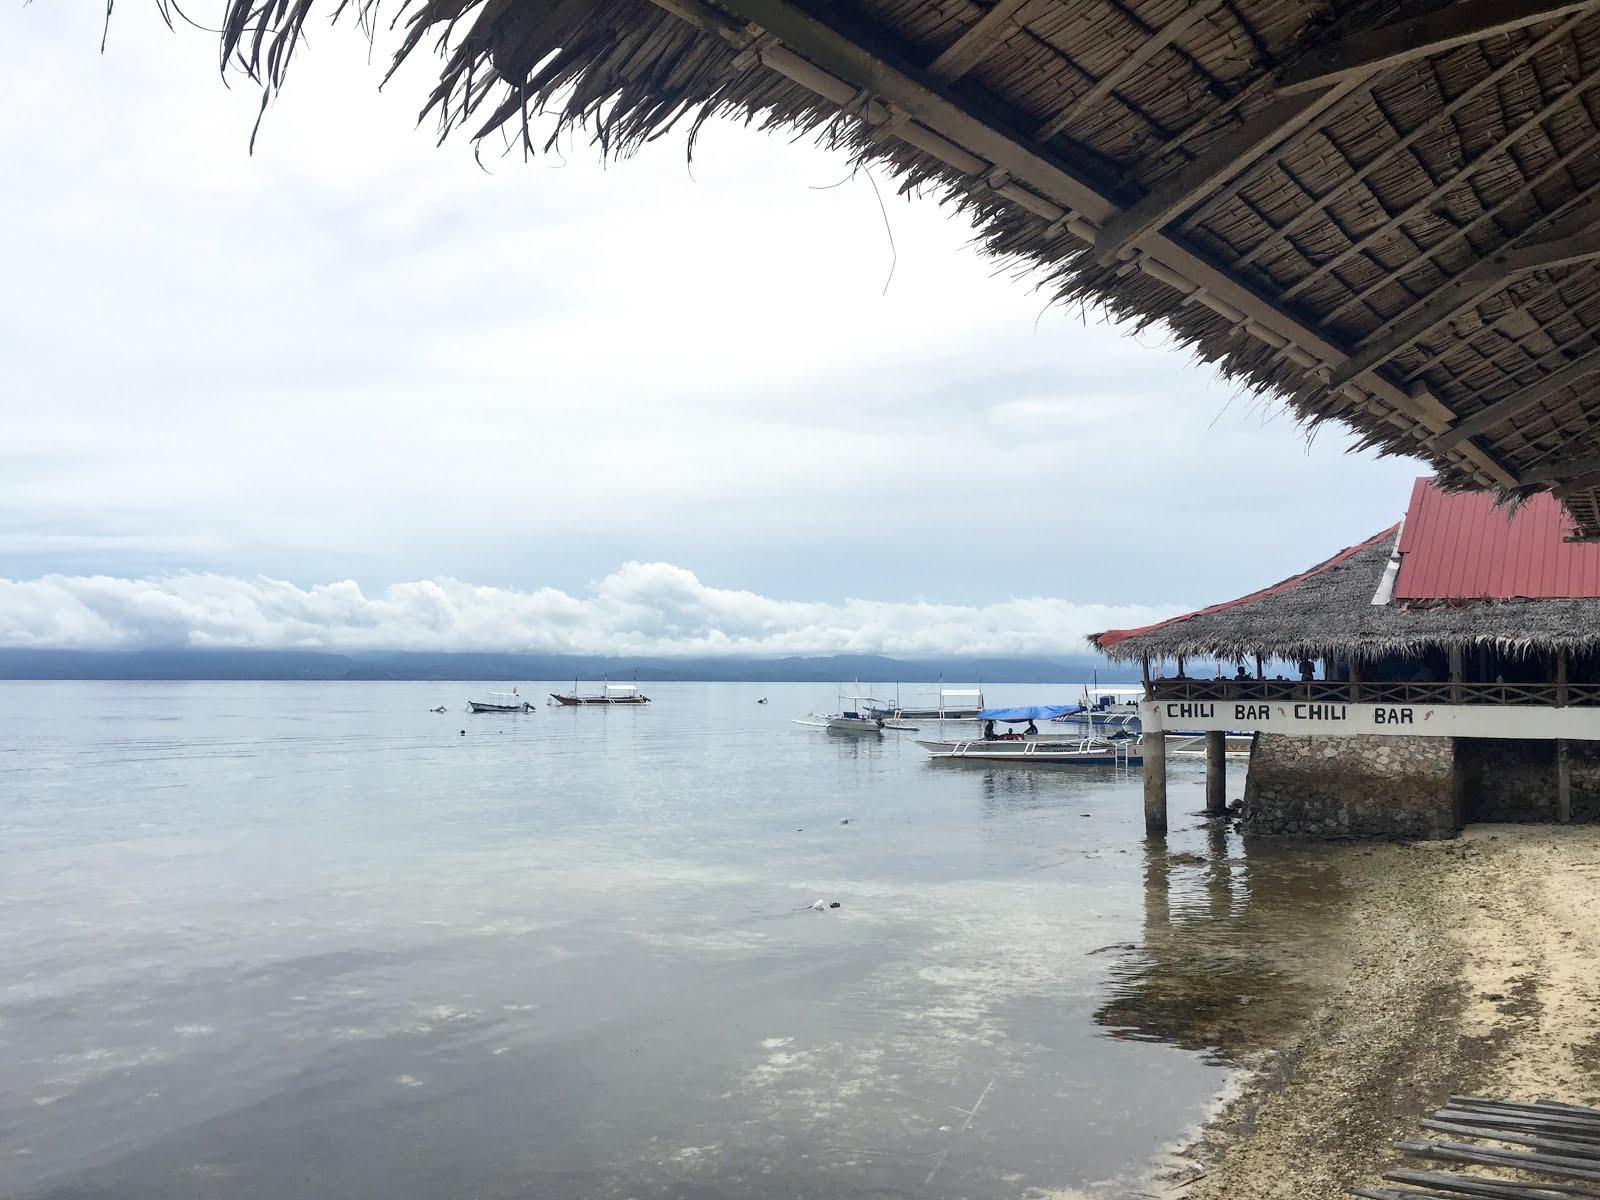 Chillis Bar Panagsama Beach Moalboal